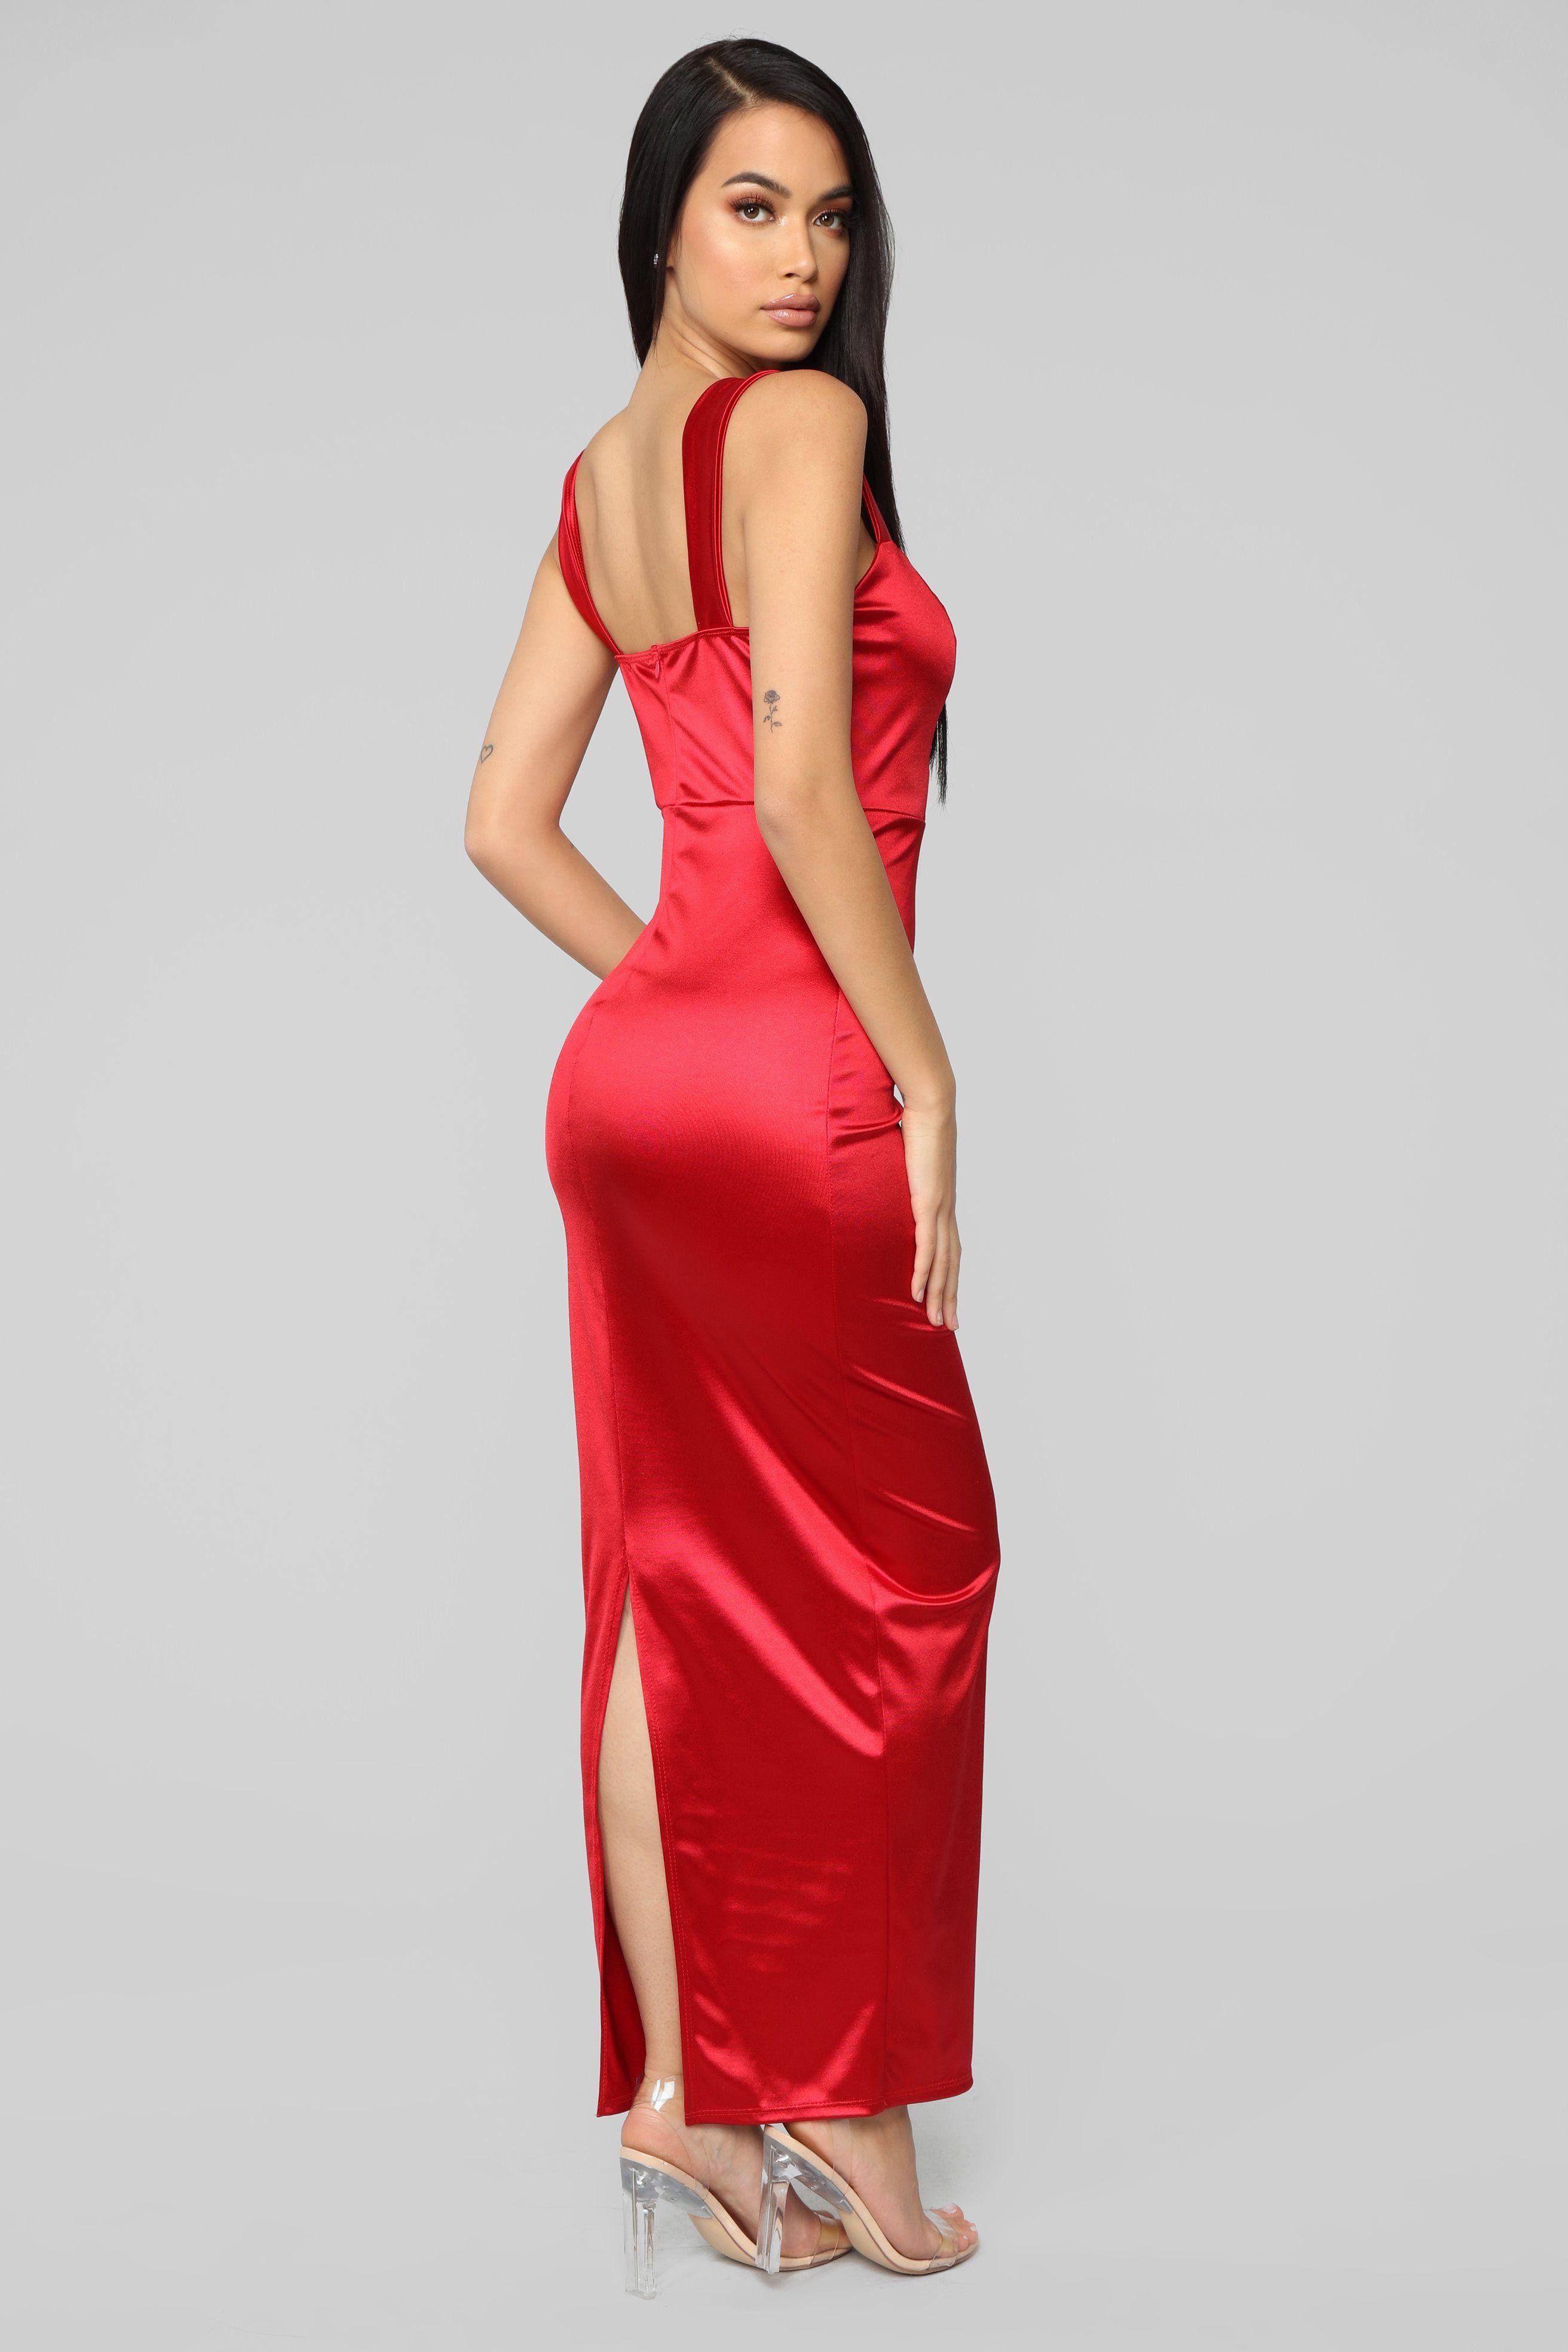 Close Up Ready Dress Red Dresses, Red dress, Silk